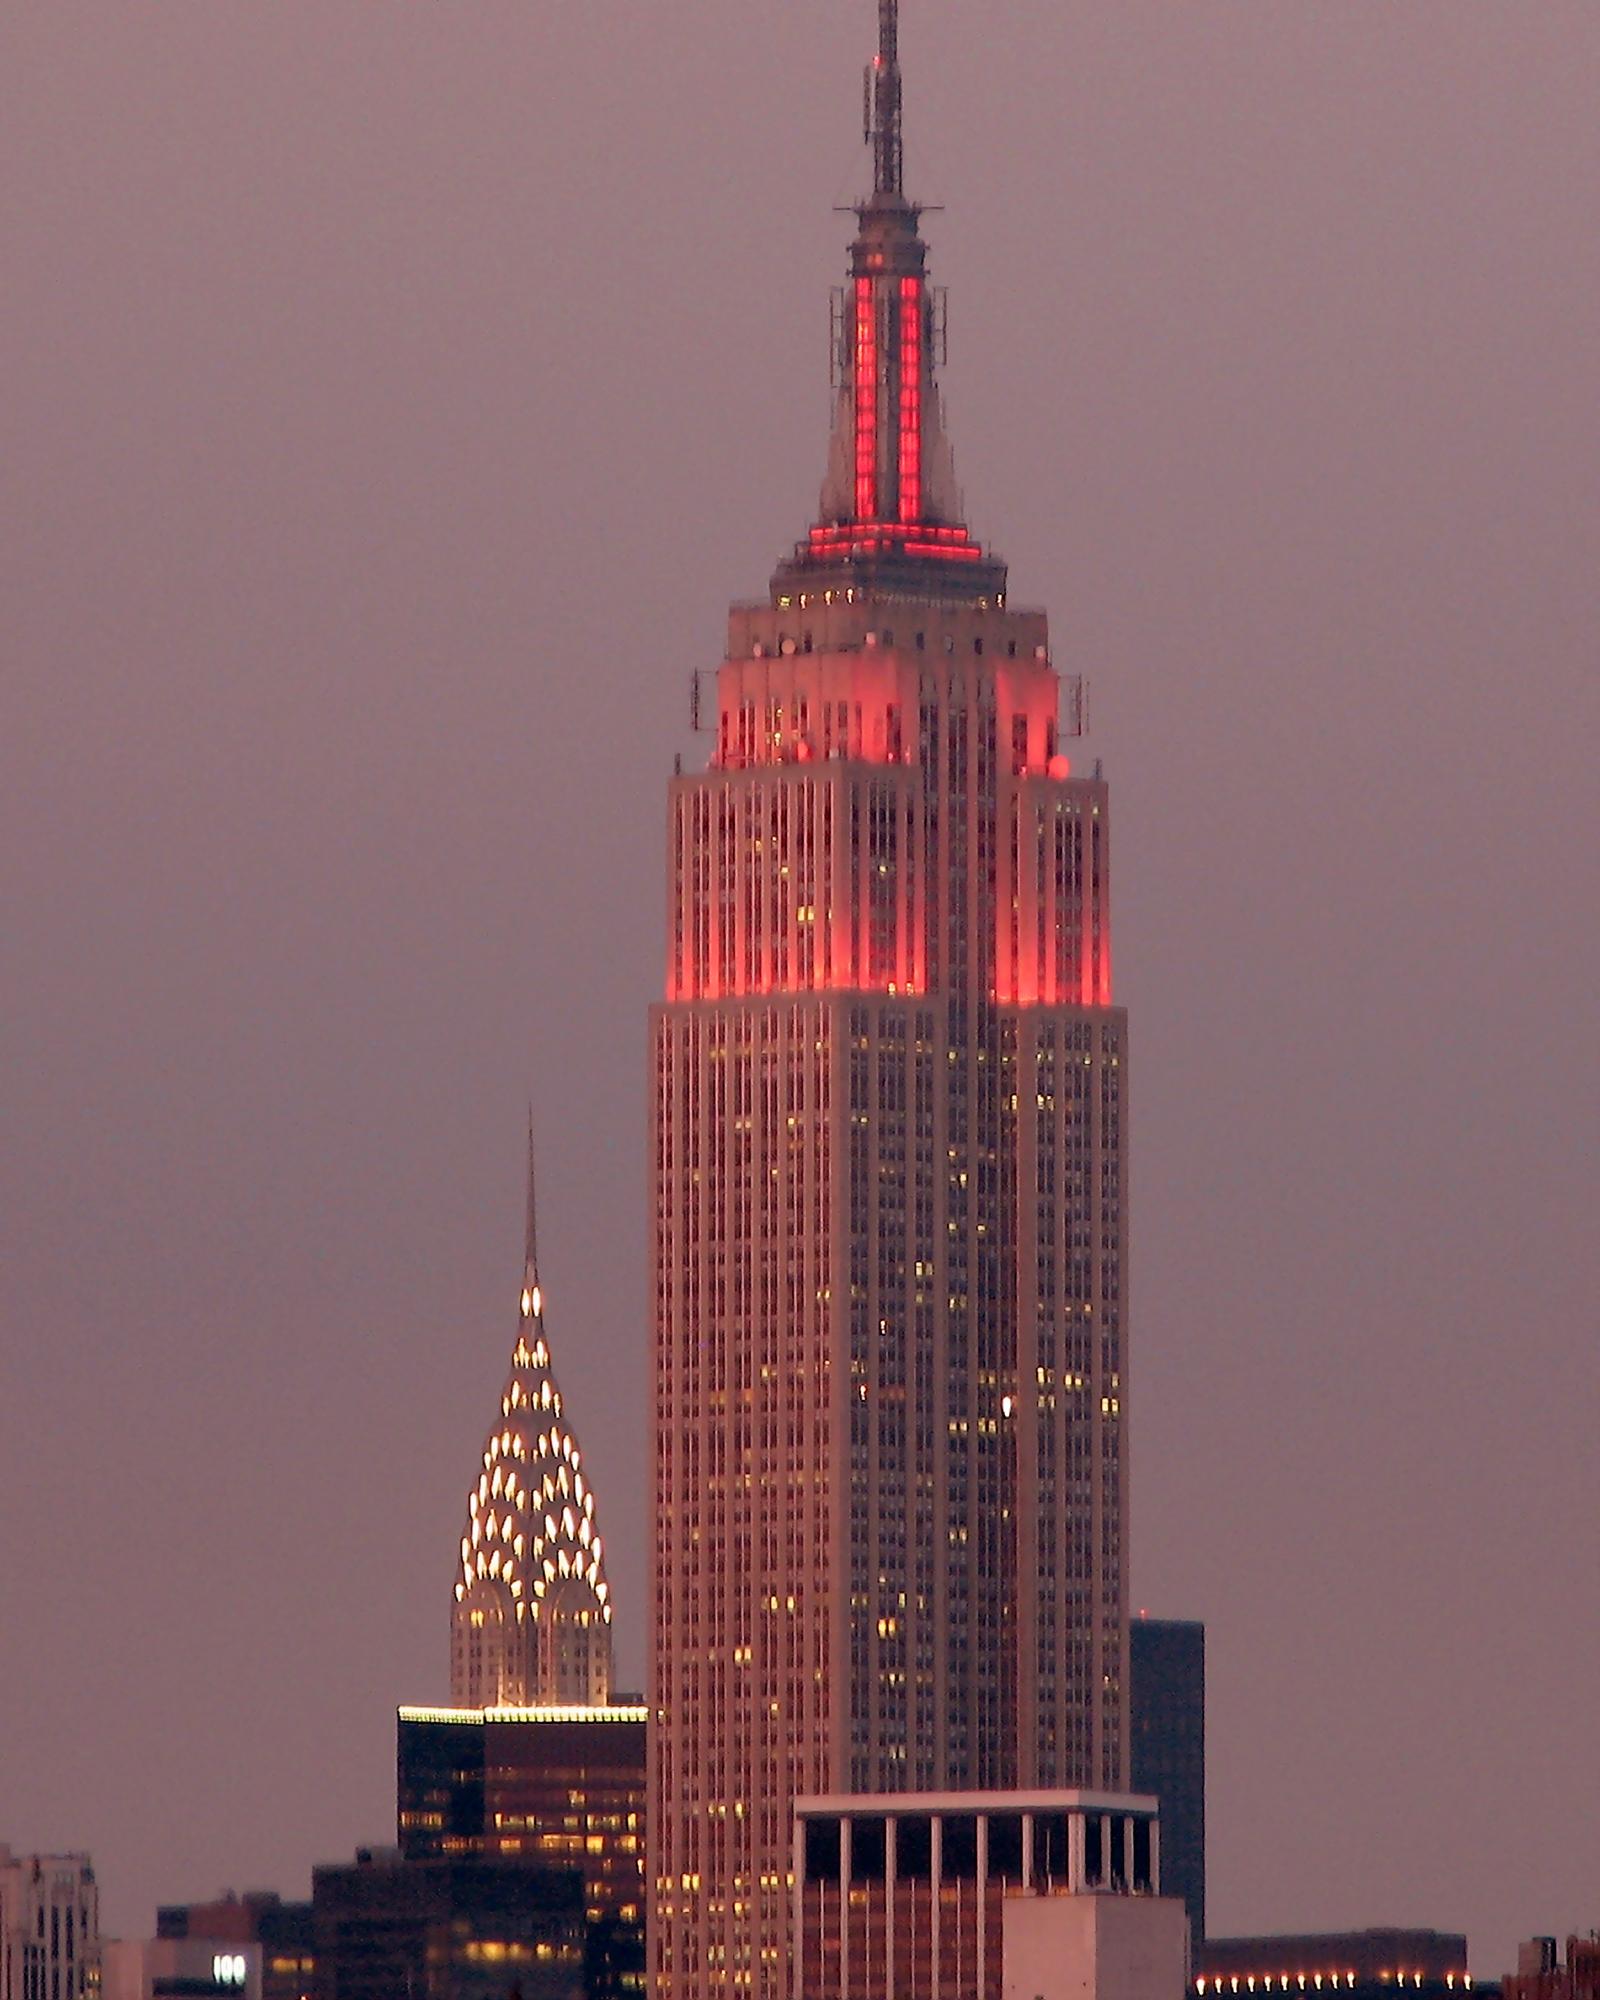 https://i1.wp.com/upload.wikimedia.org/wikipedia/commons/d/d2/Manhattan_at_Dusk_by_slonecker.jpg